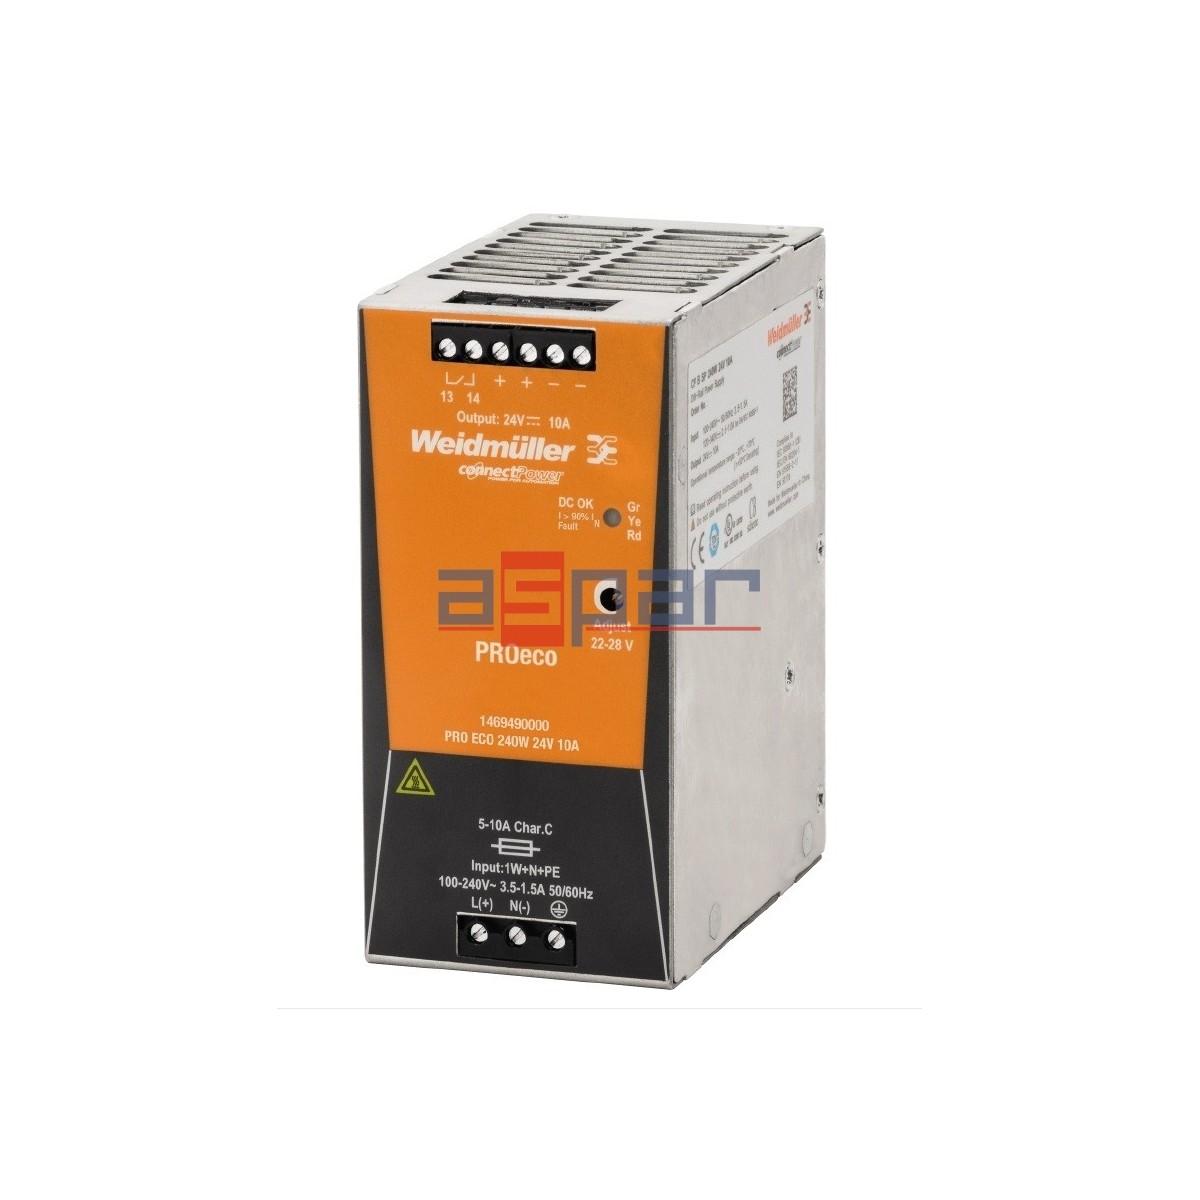 PROeco 240W 24VDC 10A